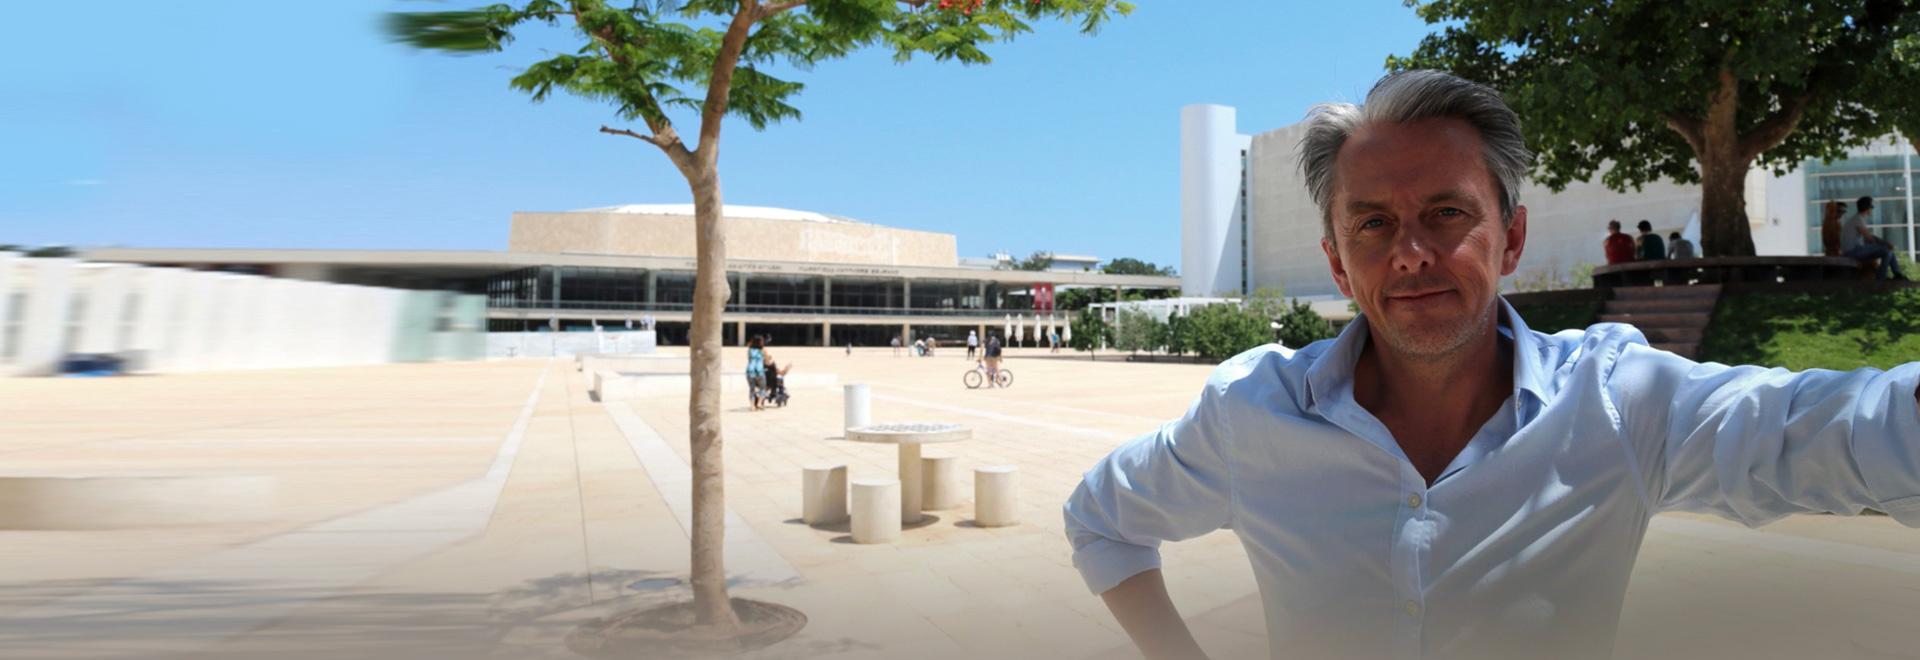 Tel Aviv, la città bianca e la città nera